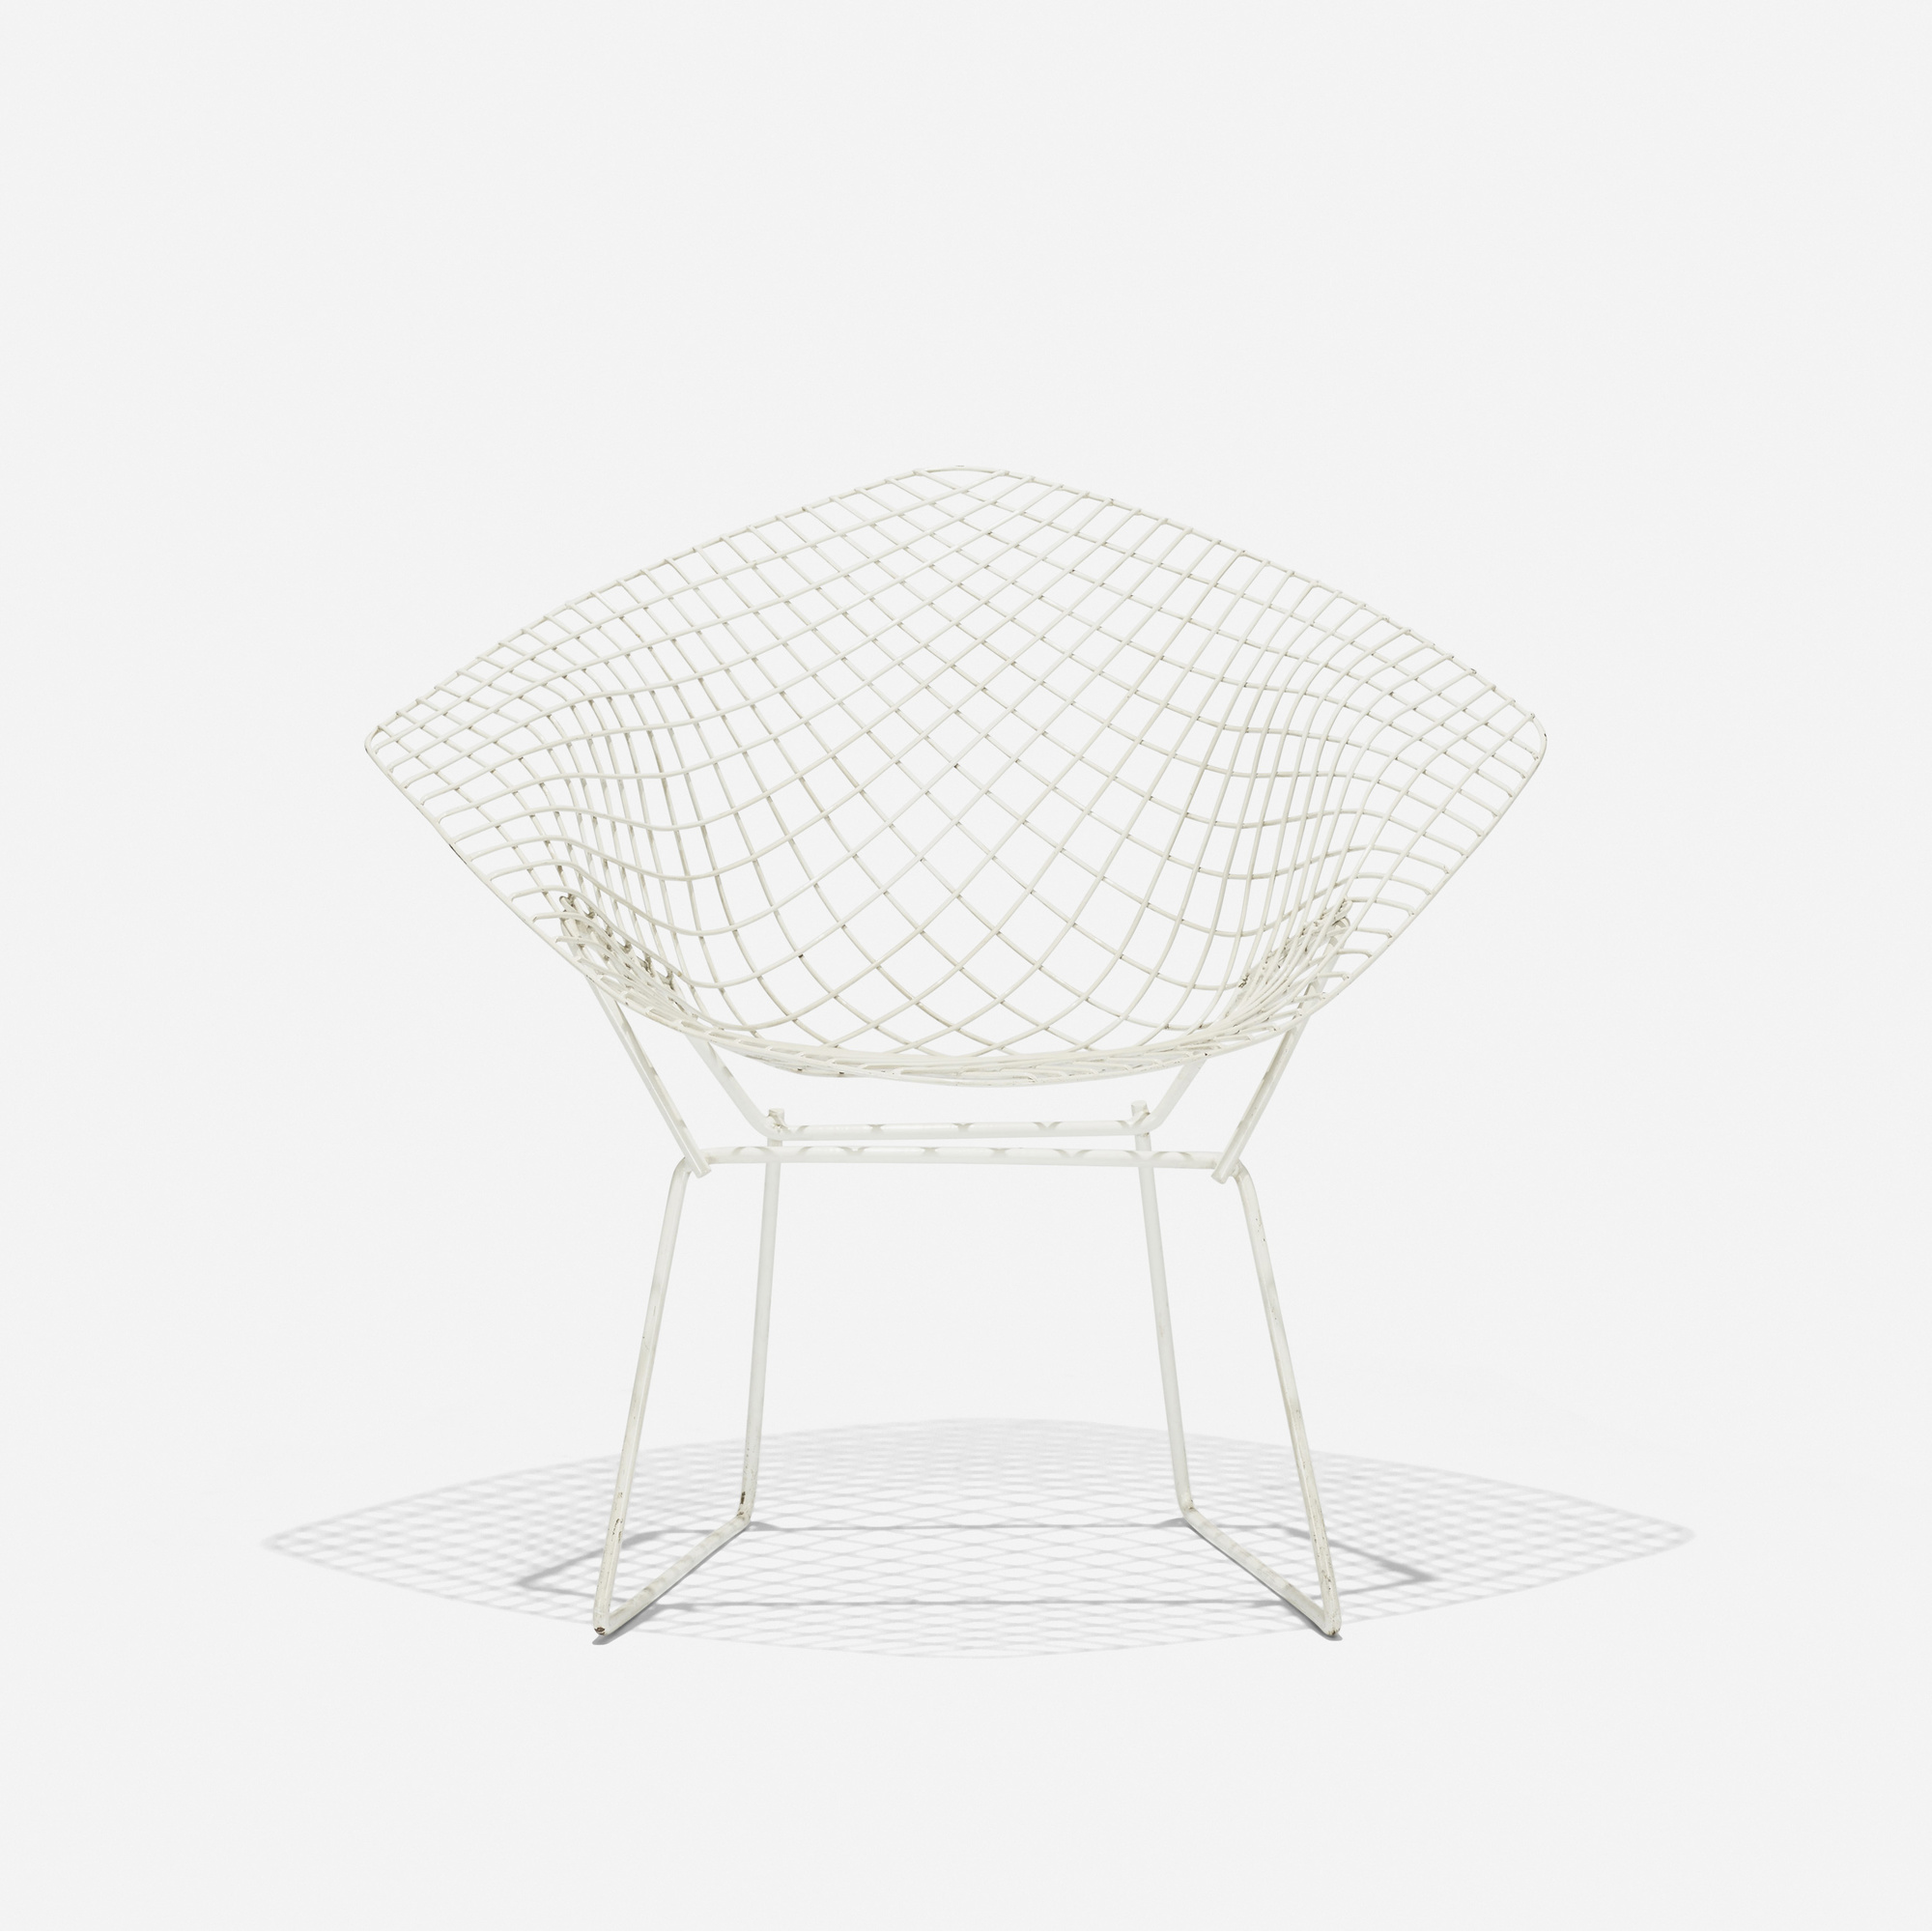 231: Harry Bertoia / Small Diamond chair (1 of 3)